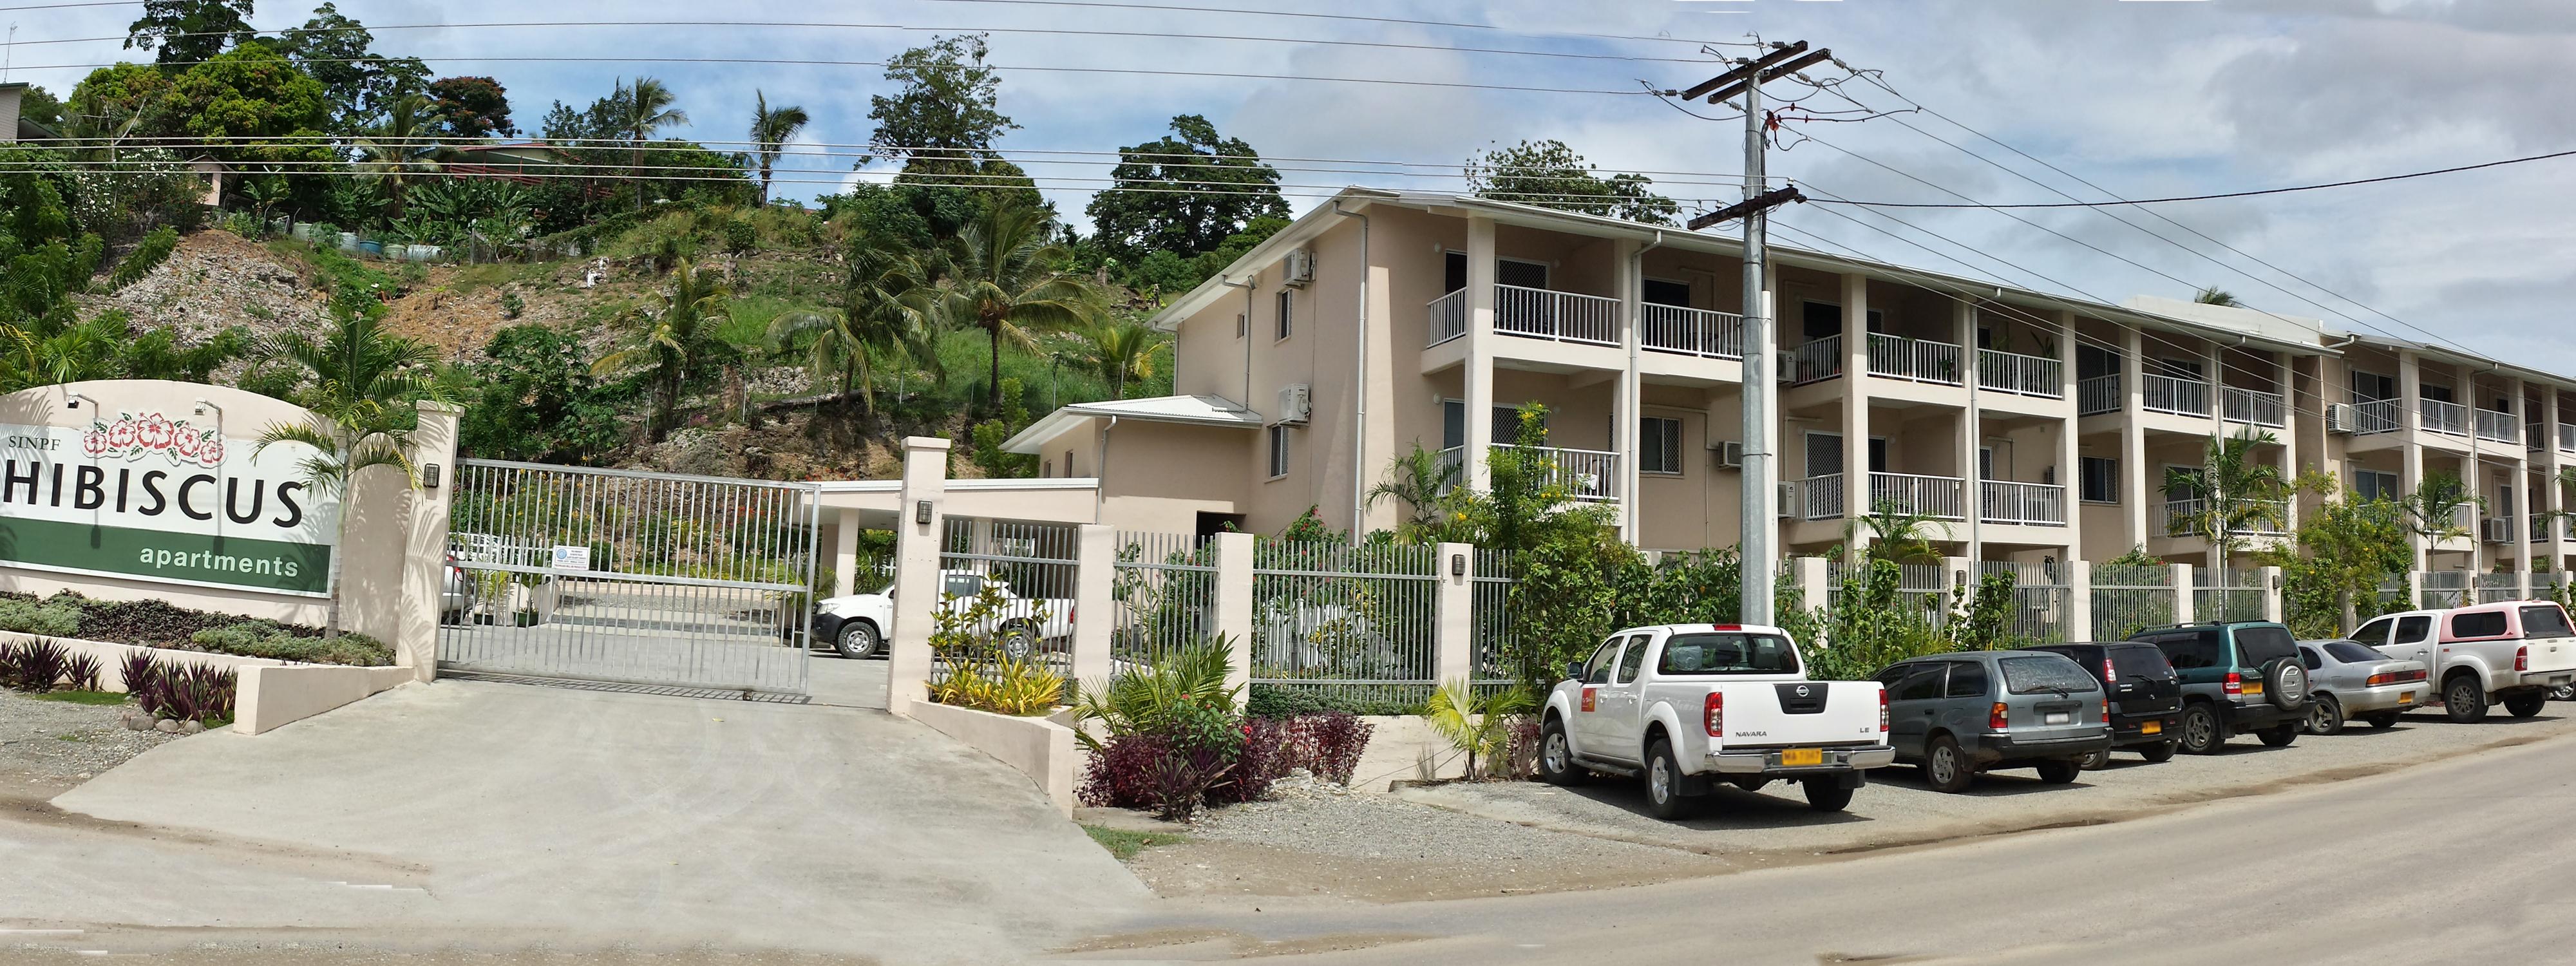 File Sinpf Hibiscus Apartments Jpg Wikimedia Commons